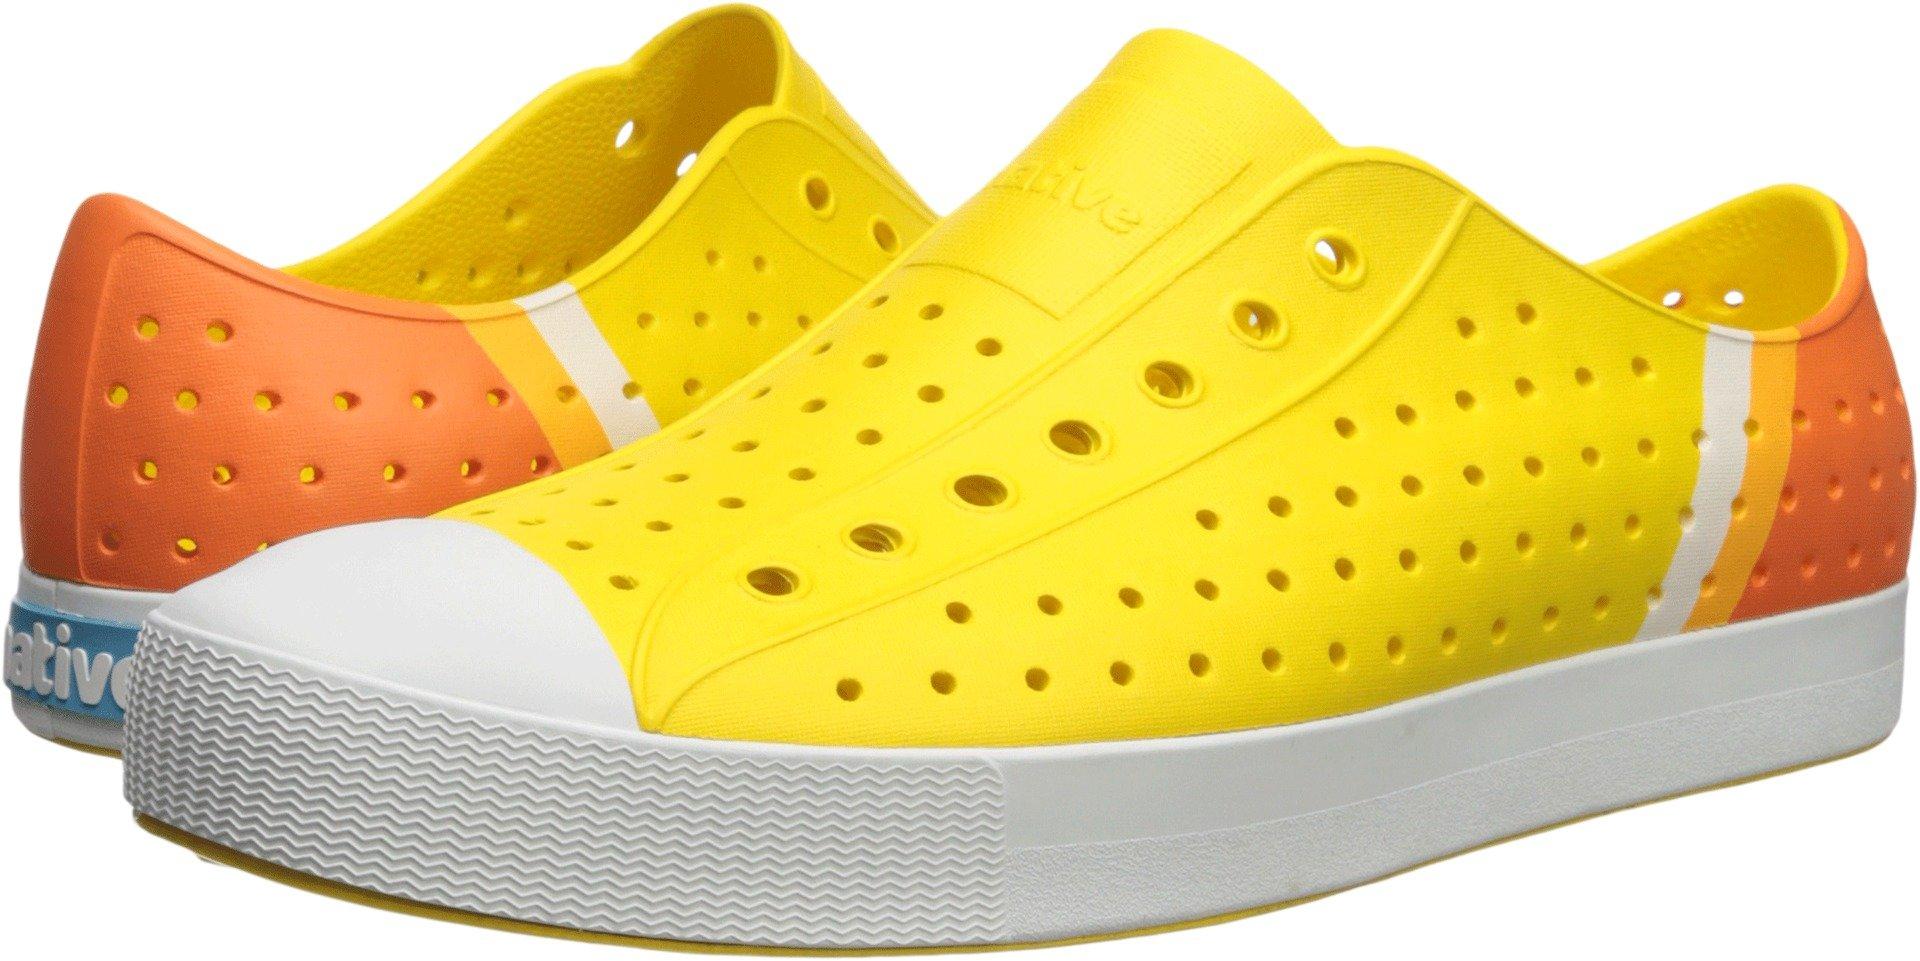 Native Shoes Jefferson Water Shoe, Crayon Yellow/Shell White/Gradient Block, 12 Men's M US